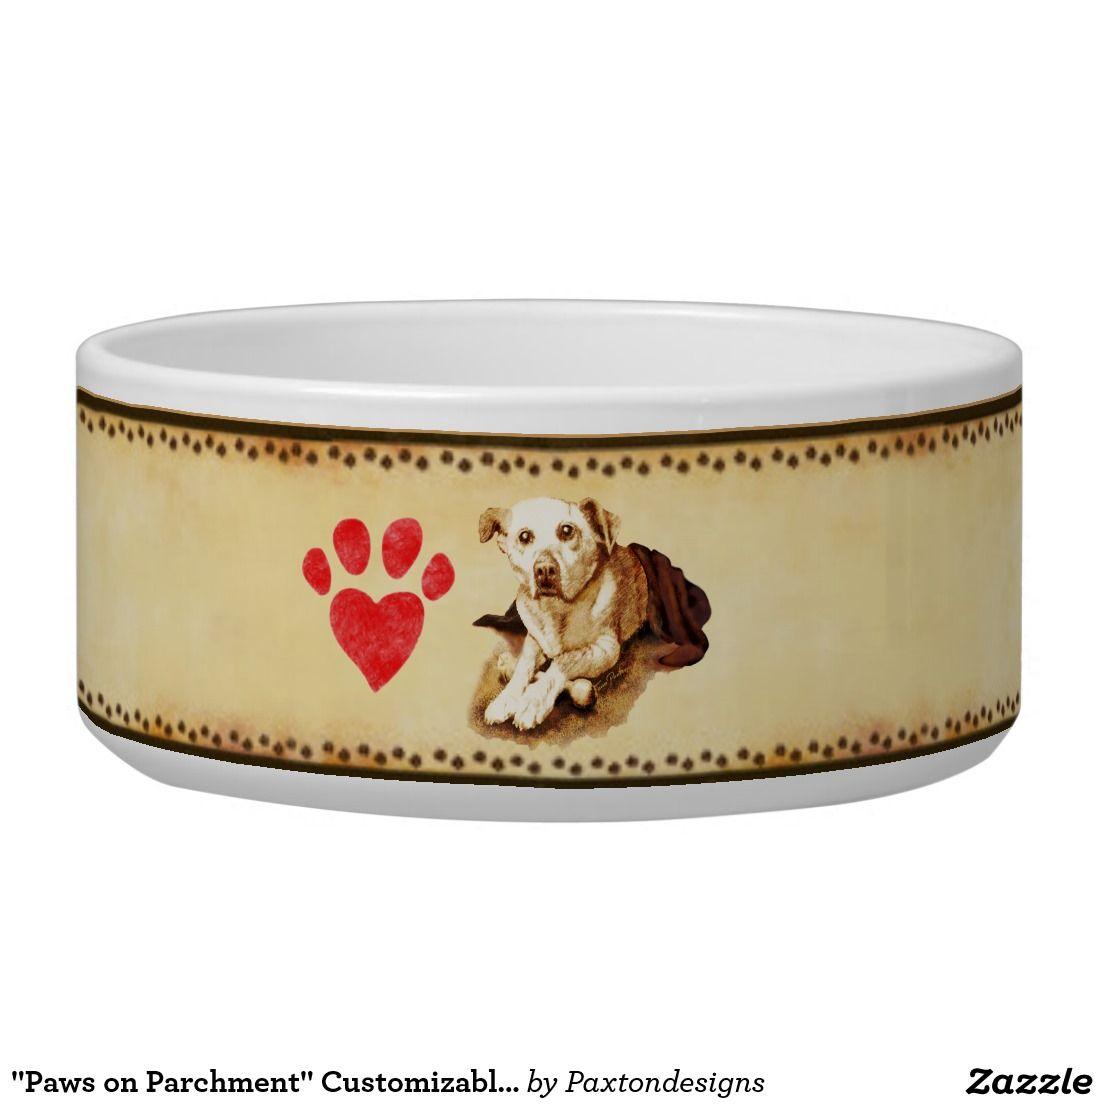 """Paws on Parchment"" Customizable Ceramic Pet Bowl"